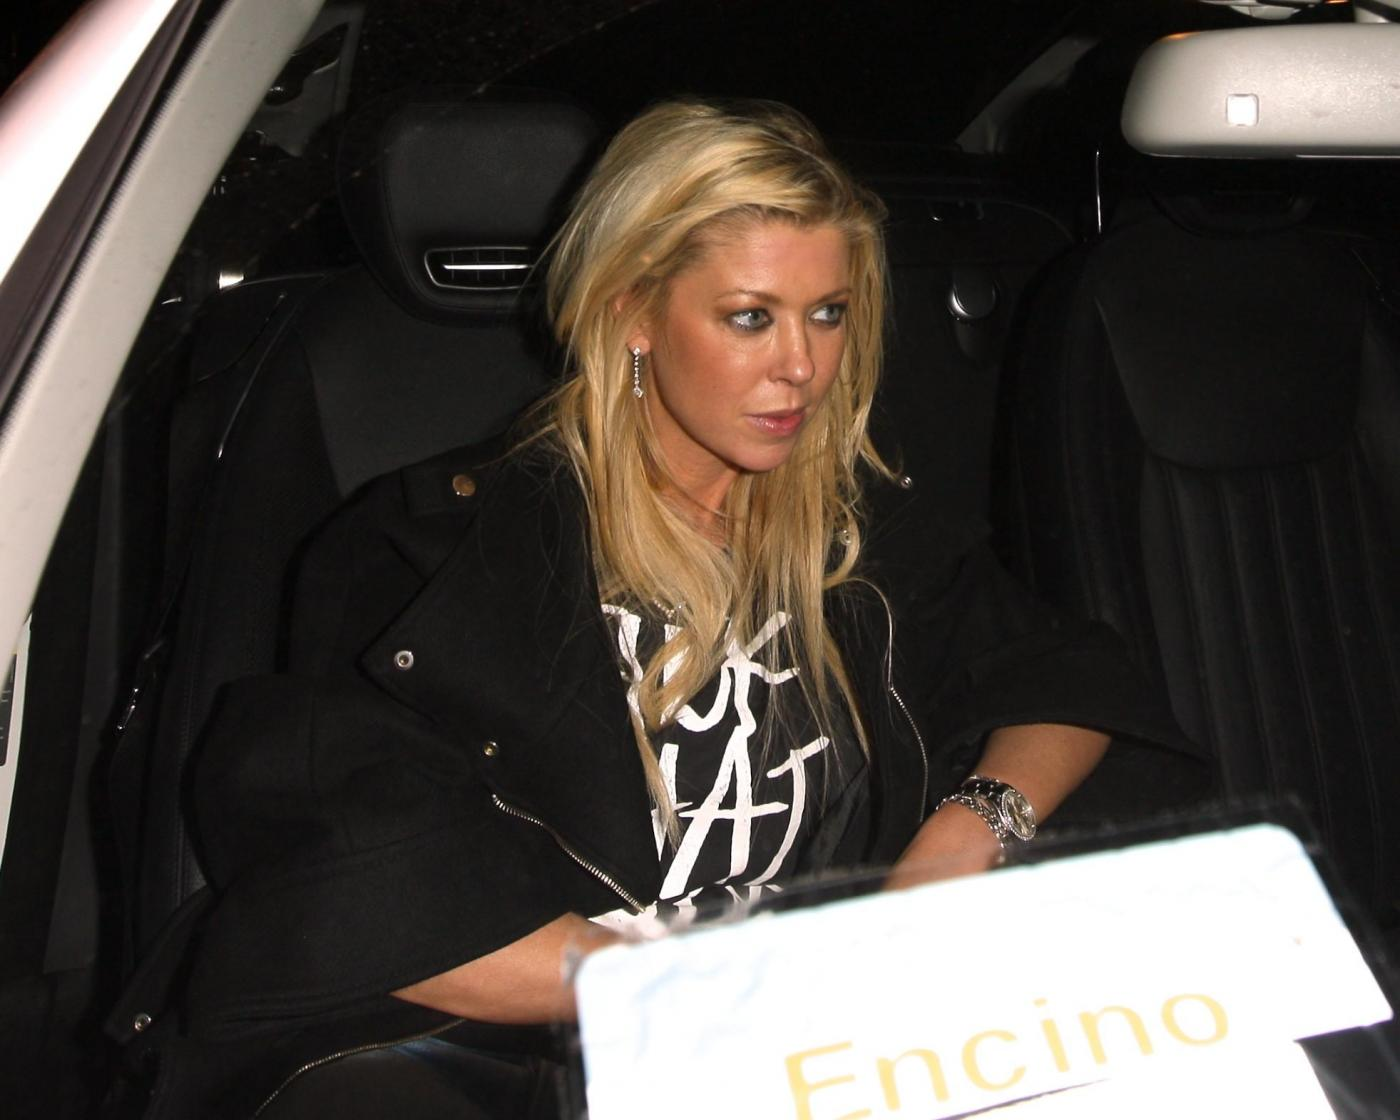 Tara Reid ubriaca lascia il ristorante Lin a West Hollywood dopo aver cenato07